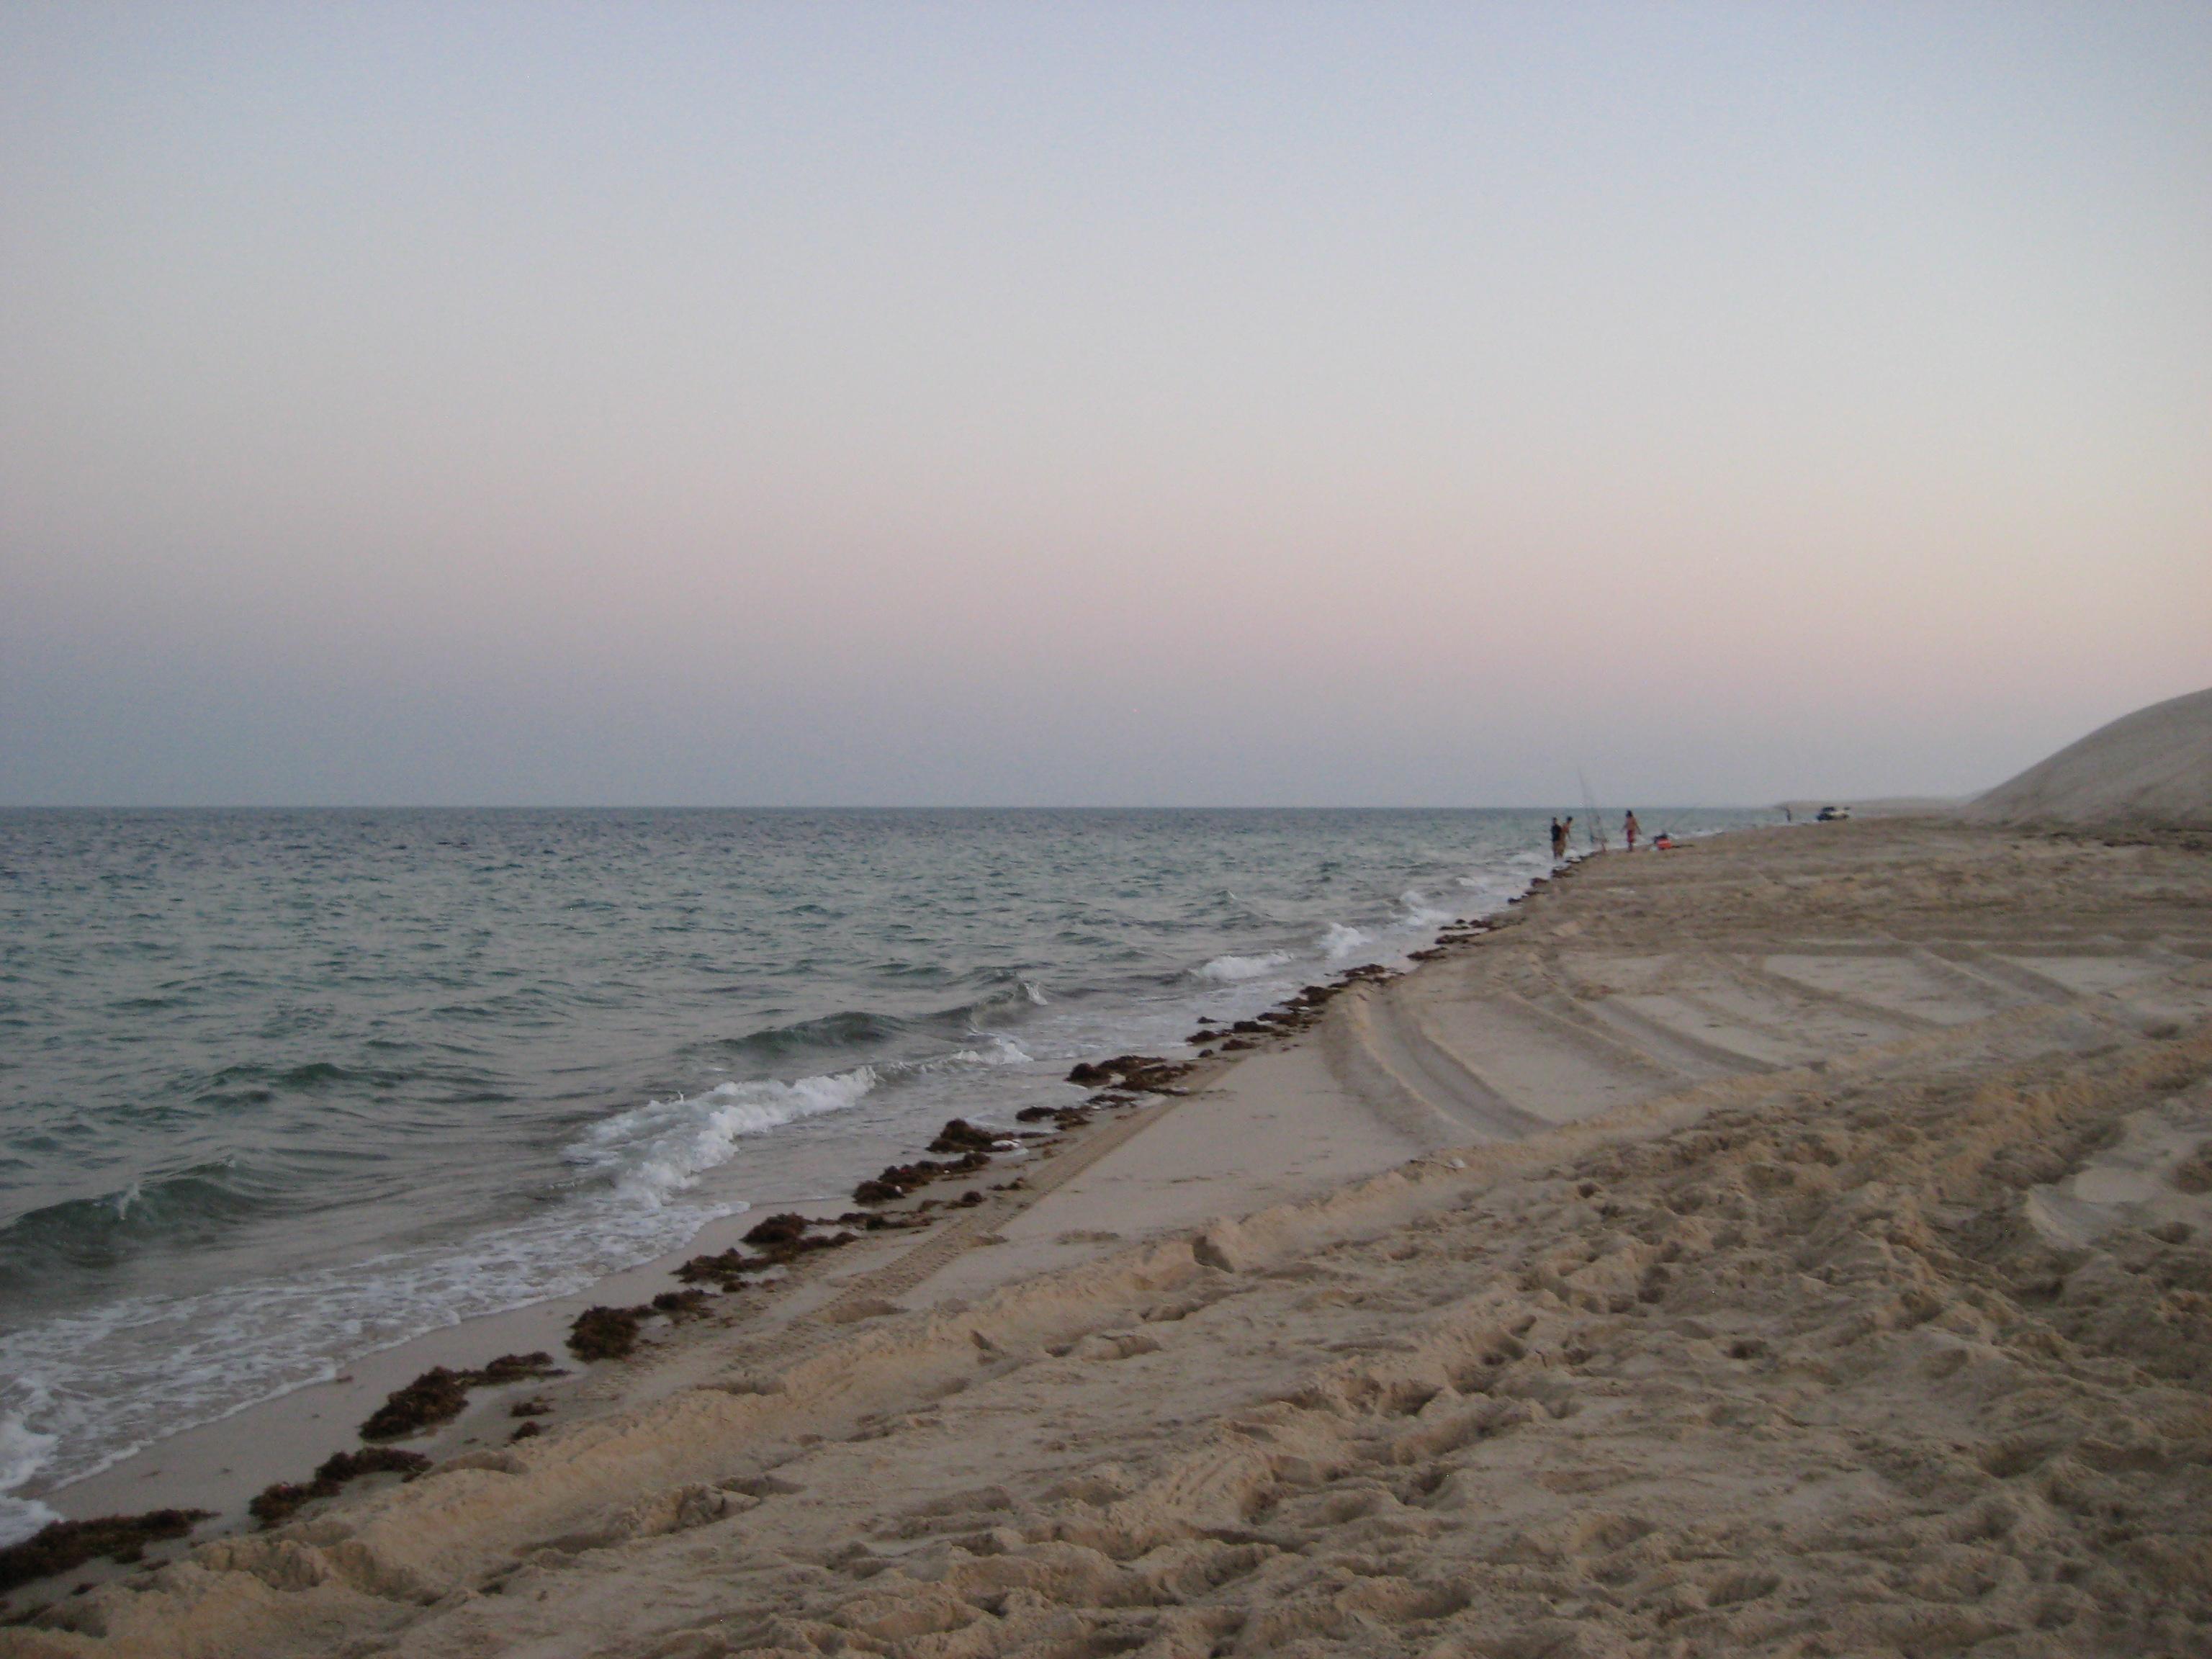 Sealine Beach Resort Entry Fee